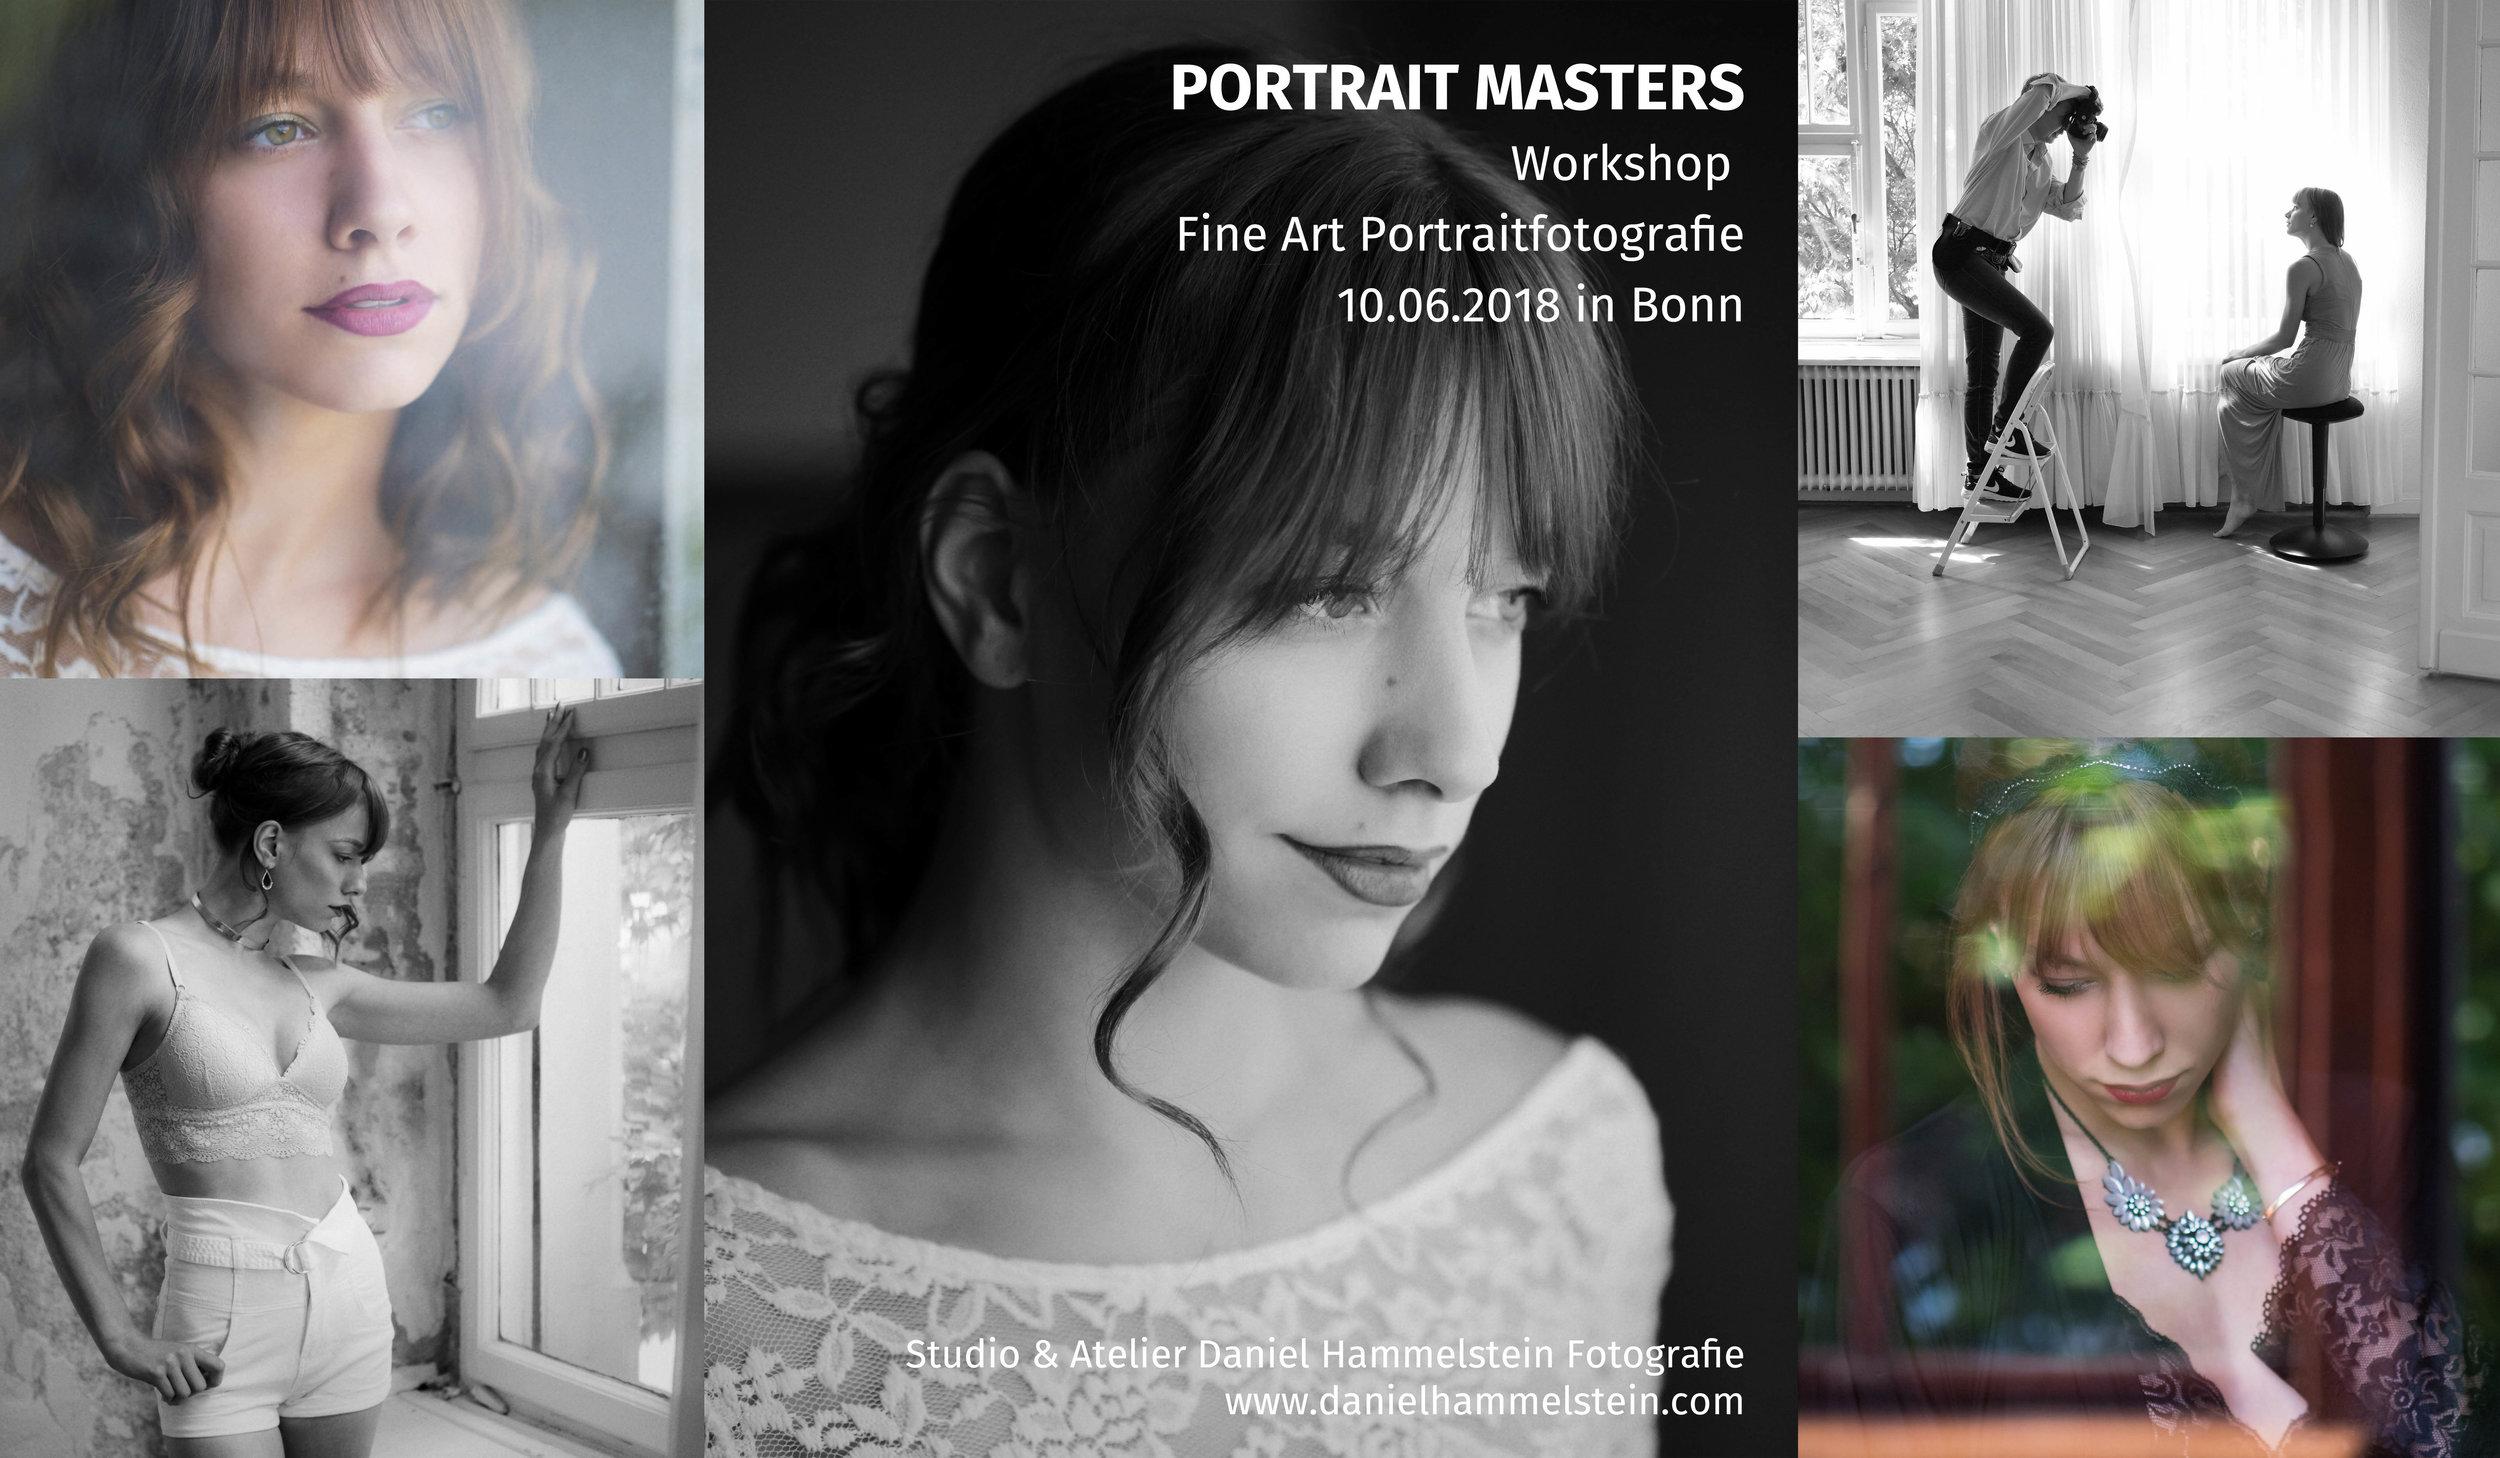 Portrait Porträt Workshop Portraitfotografie Schwarzweiß Fotoworkshop Fotokurs Bonn Köln Düsseldorf NRW Juni 2018.jpg